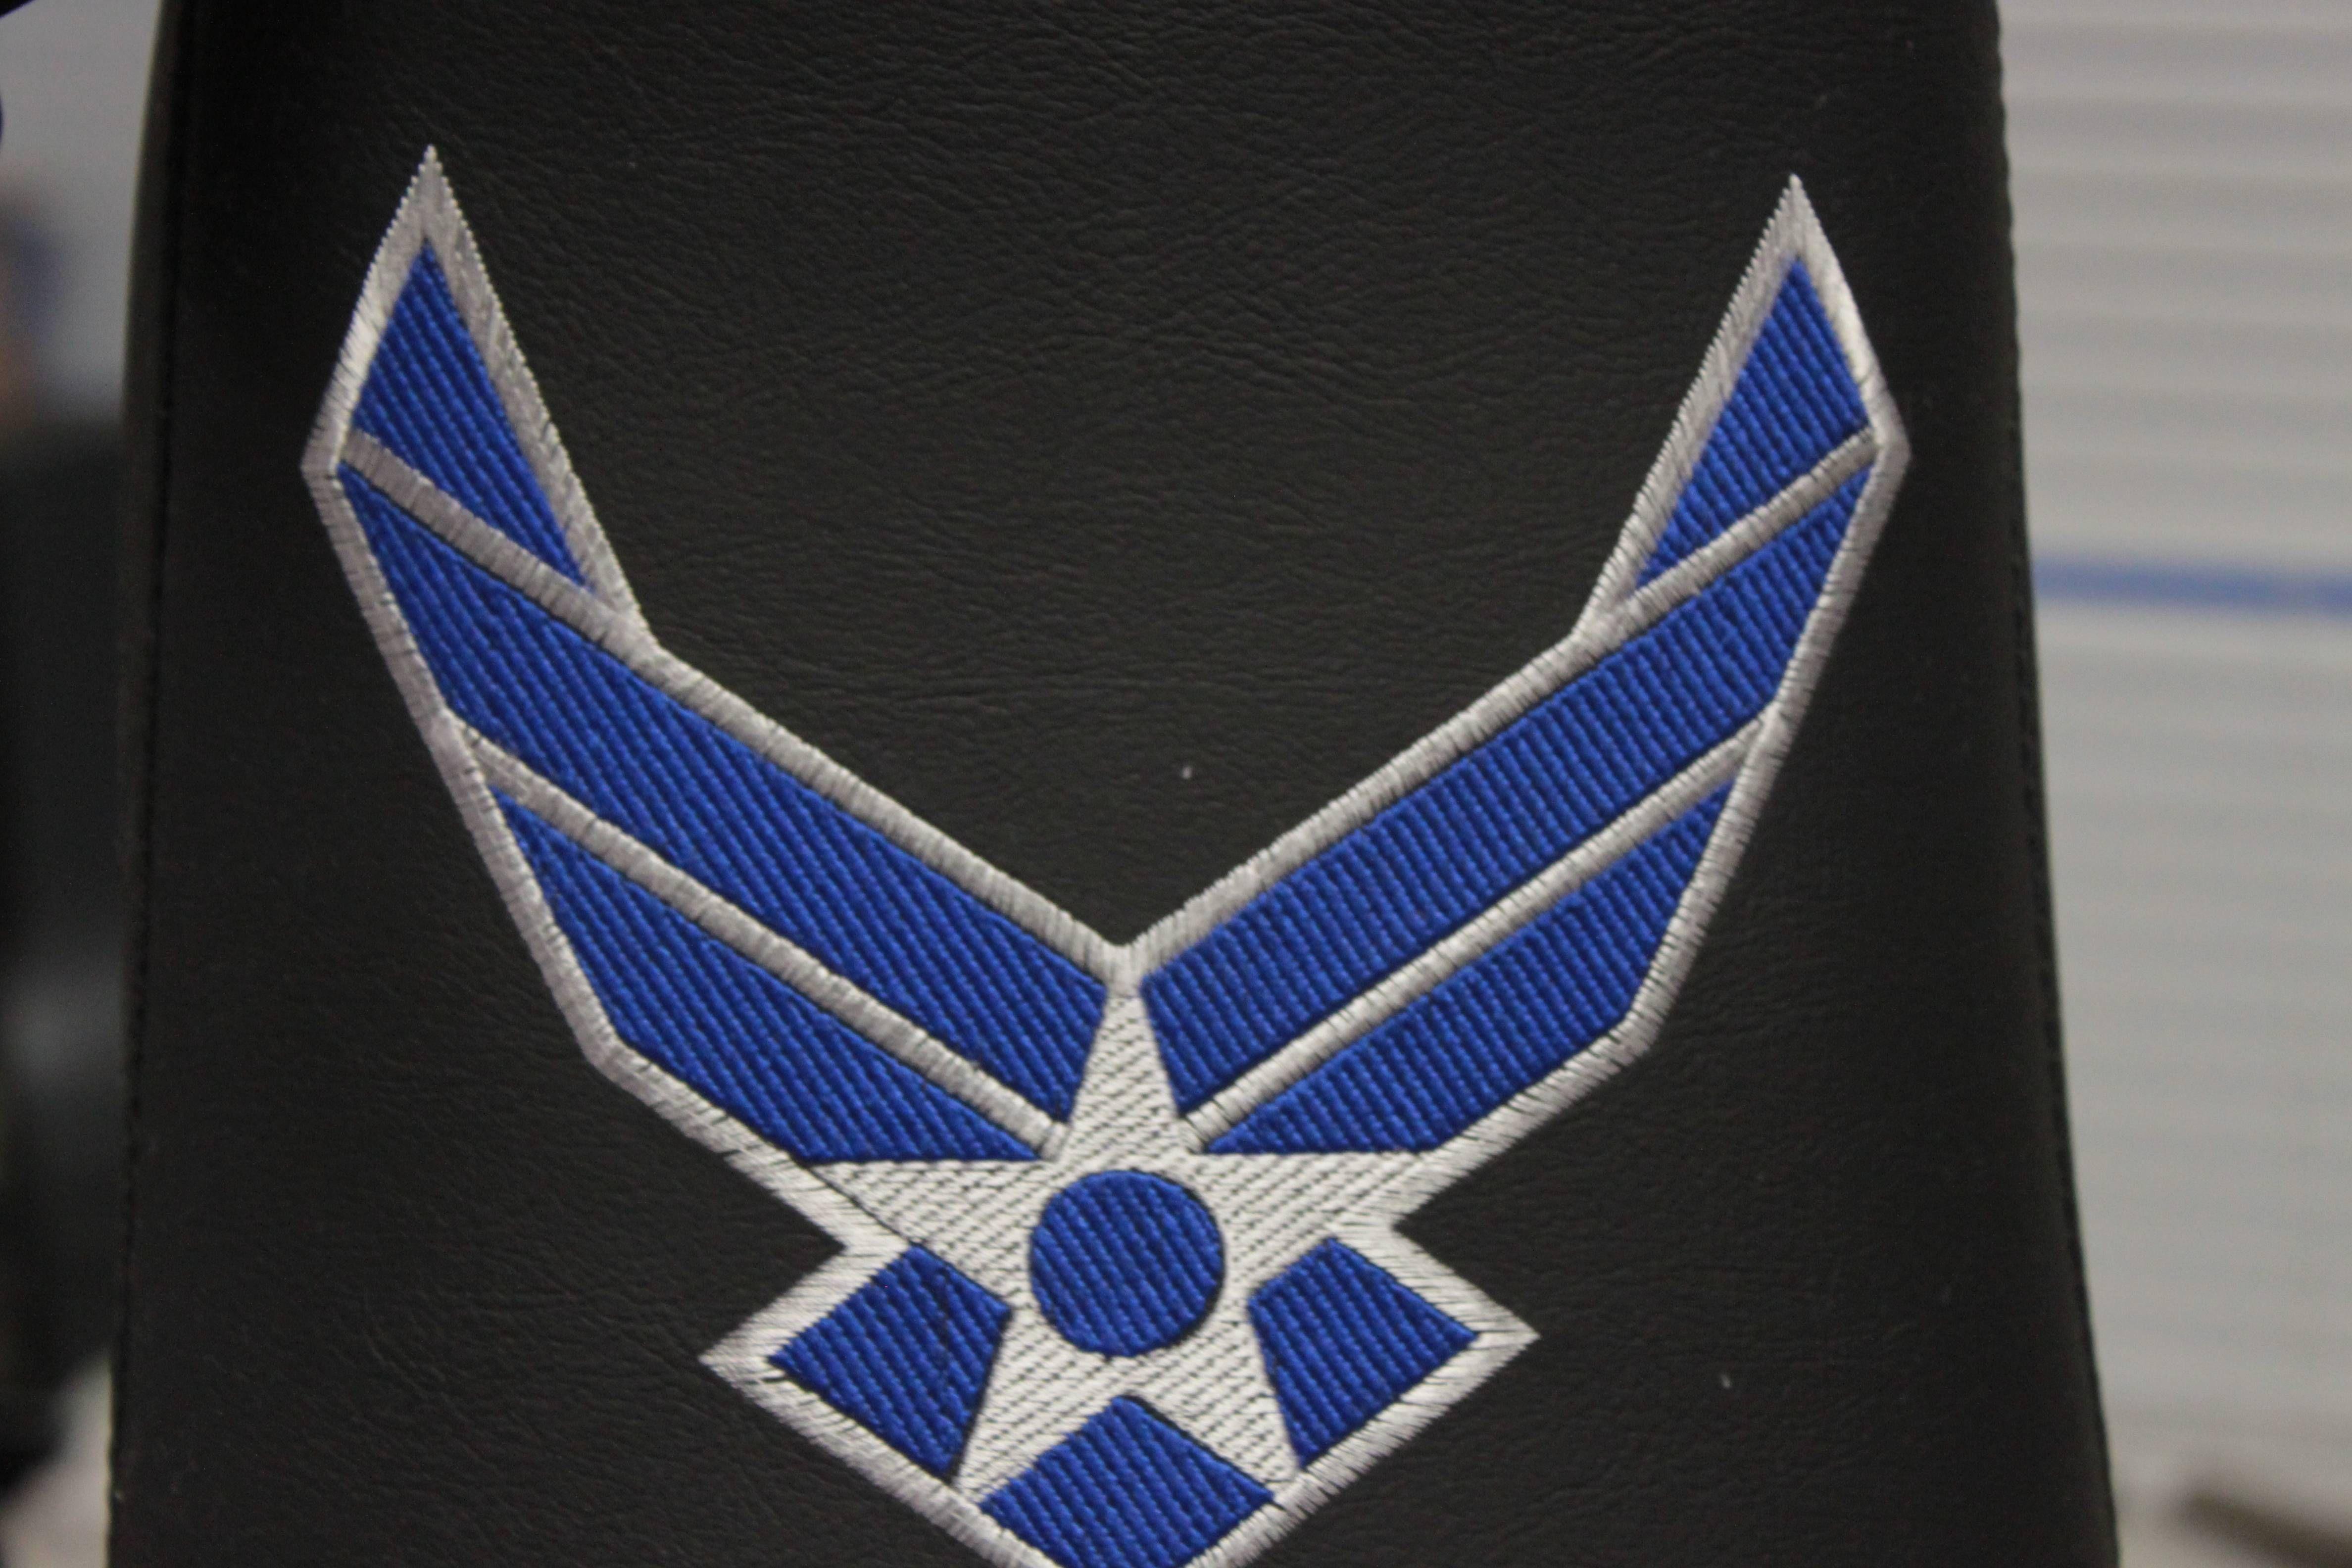 Air Force Logo Wallpapers Wallpaper Cave Air Force Wallpaper Air Force Wallpaper